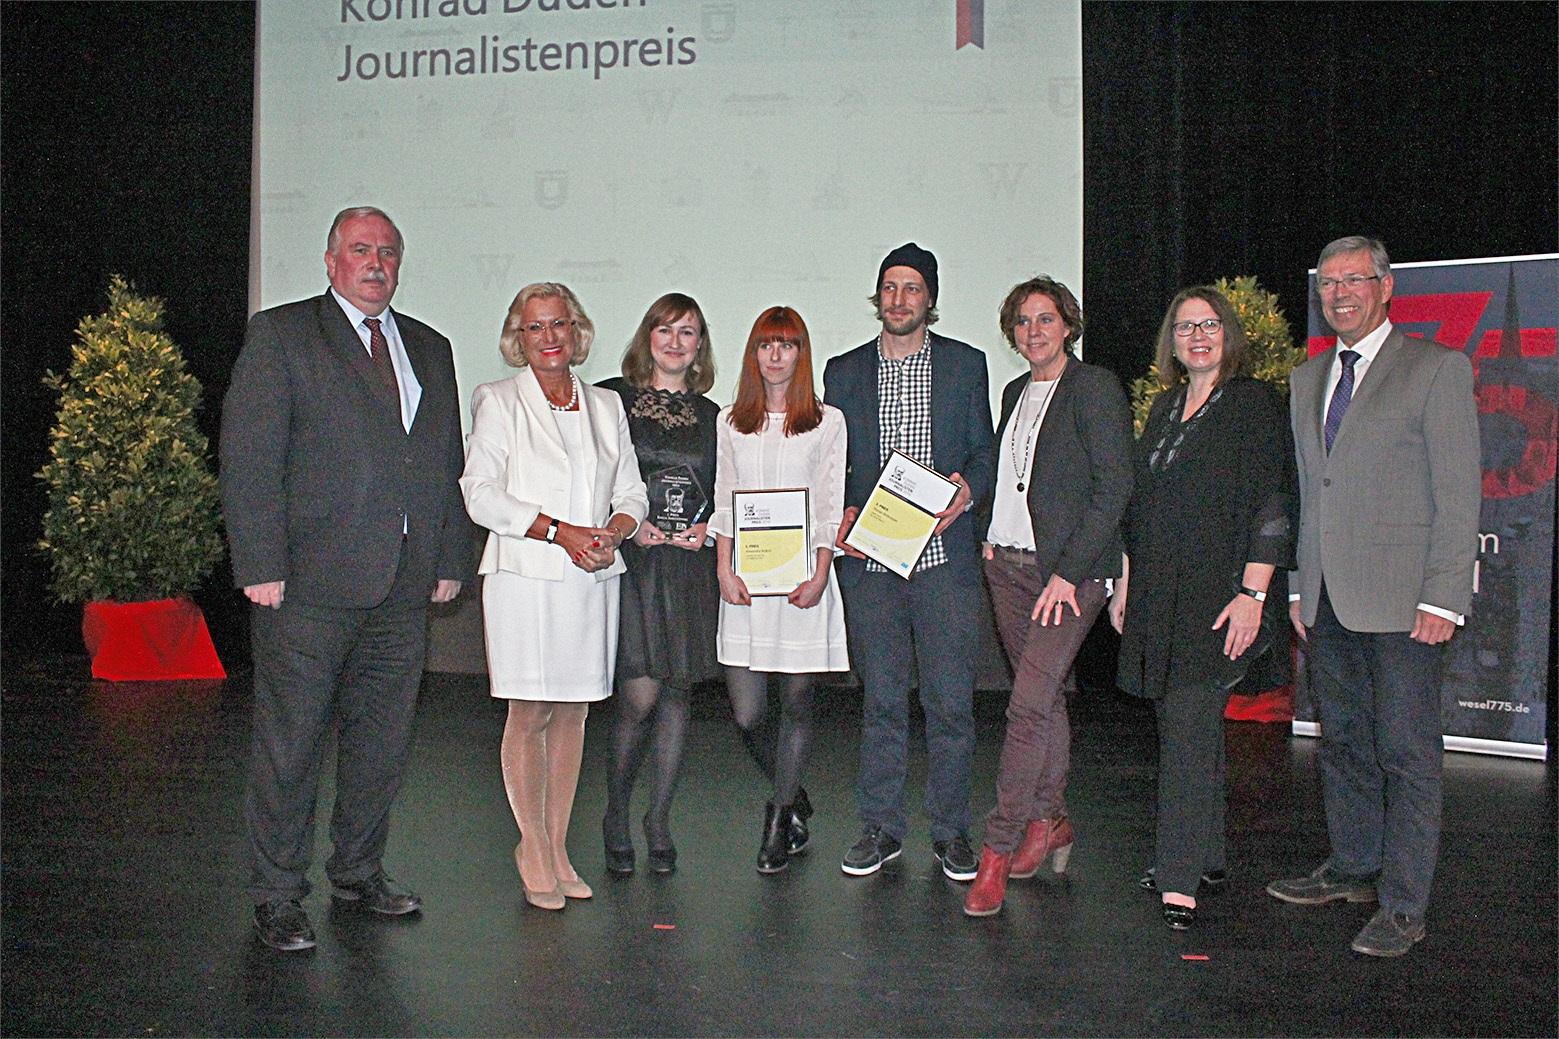 PCN - Konrad-Duden-Journalistenpreis 2016 k